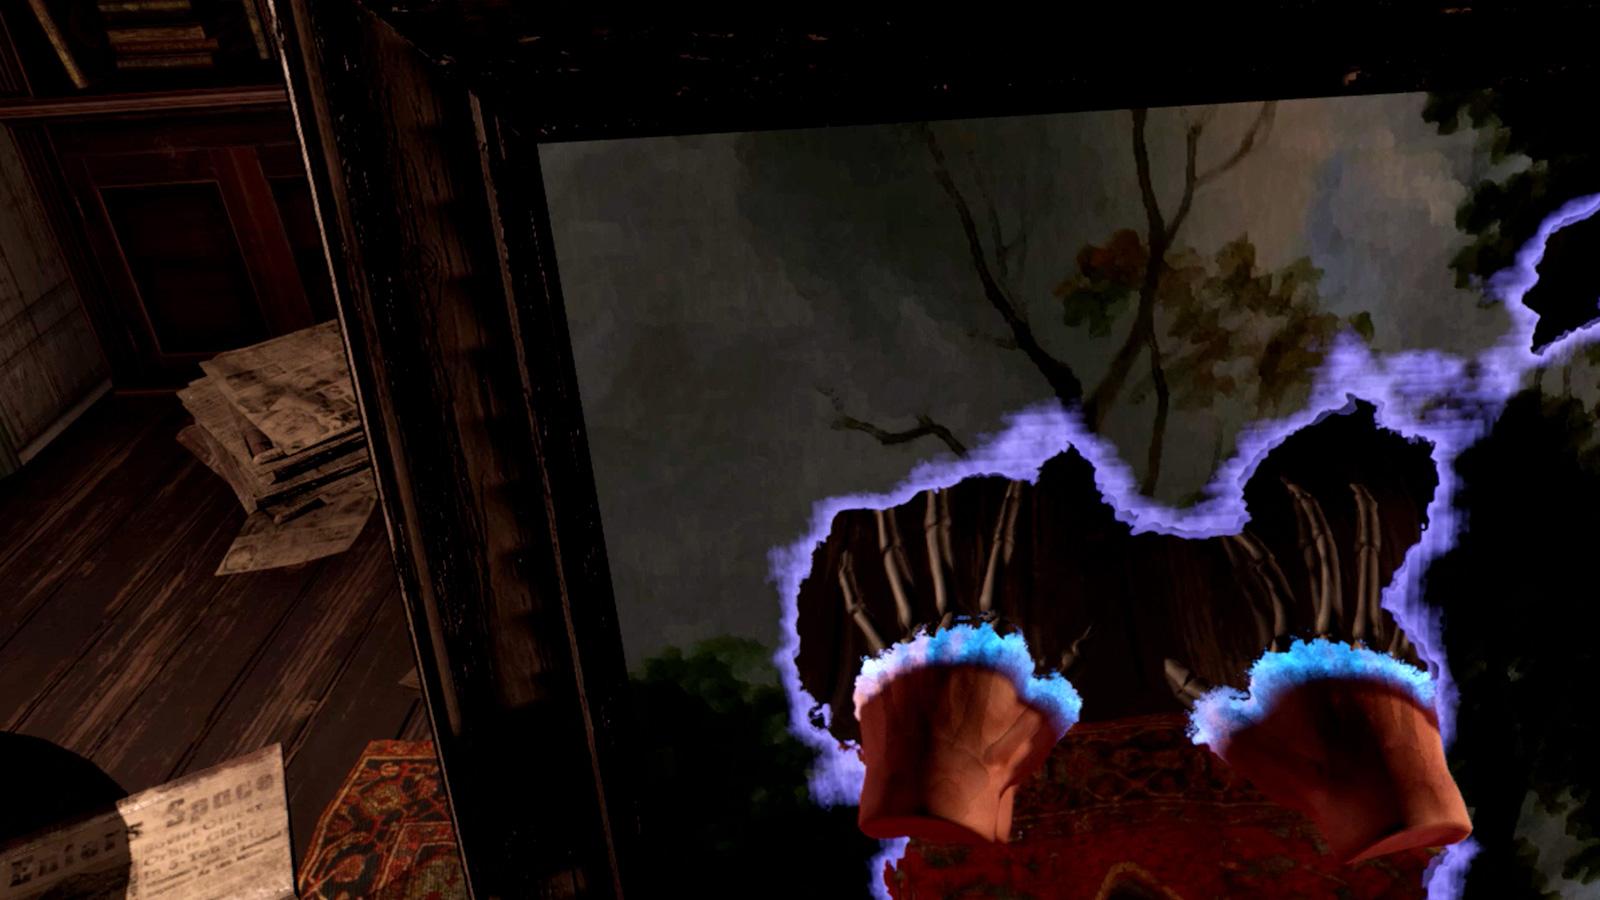 Skeleton hands through a mirror | Fallen Planet